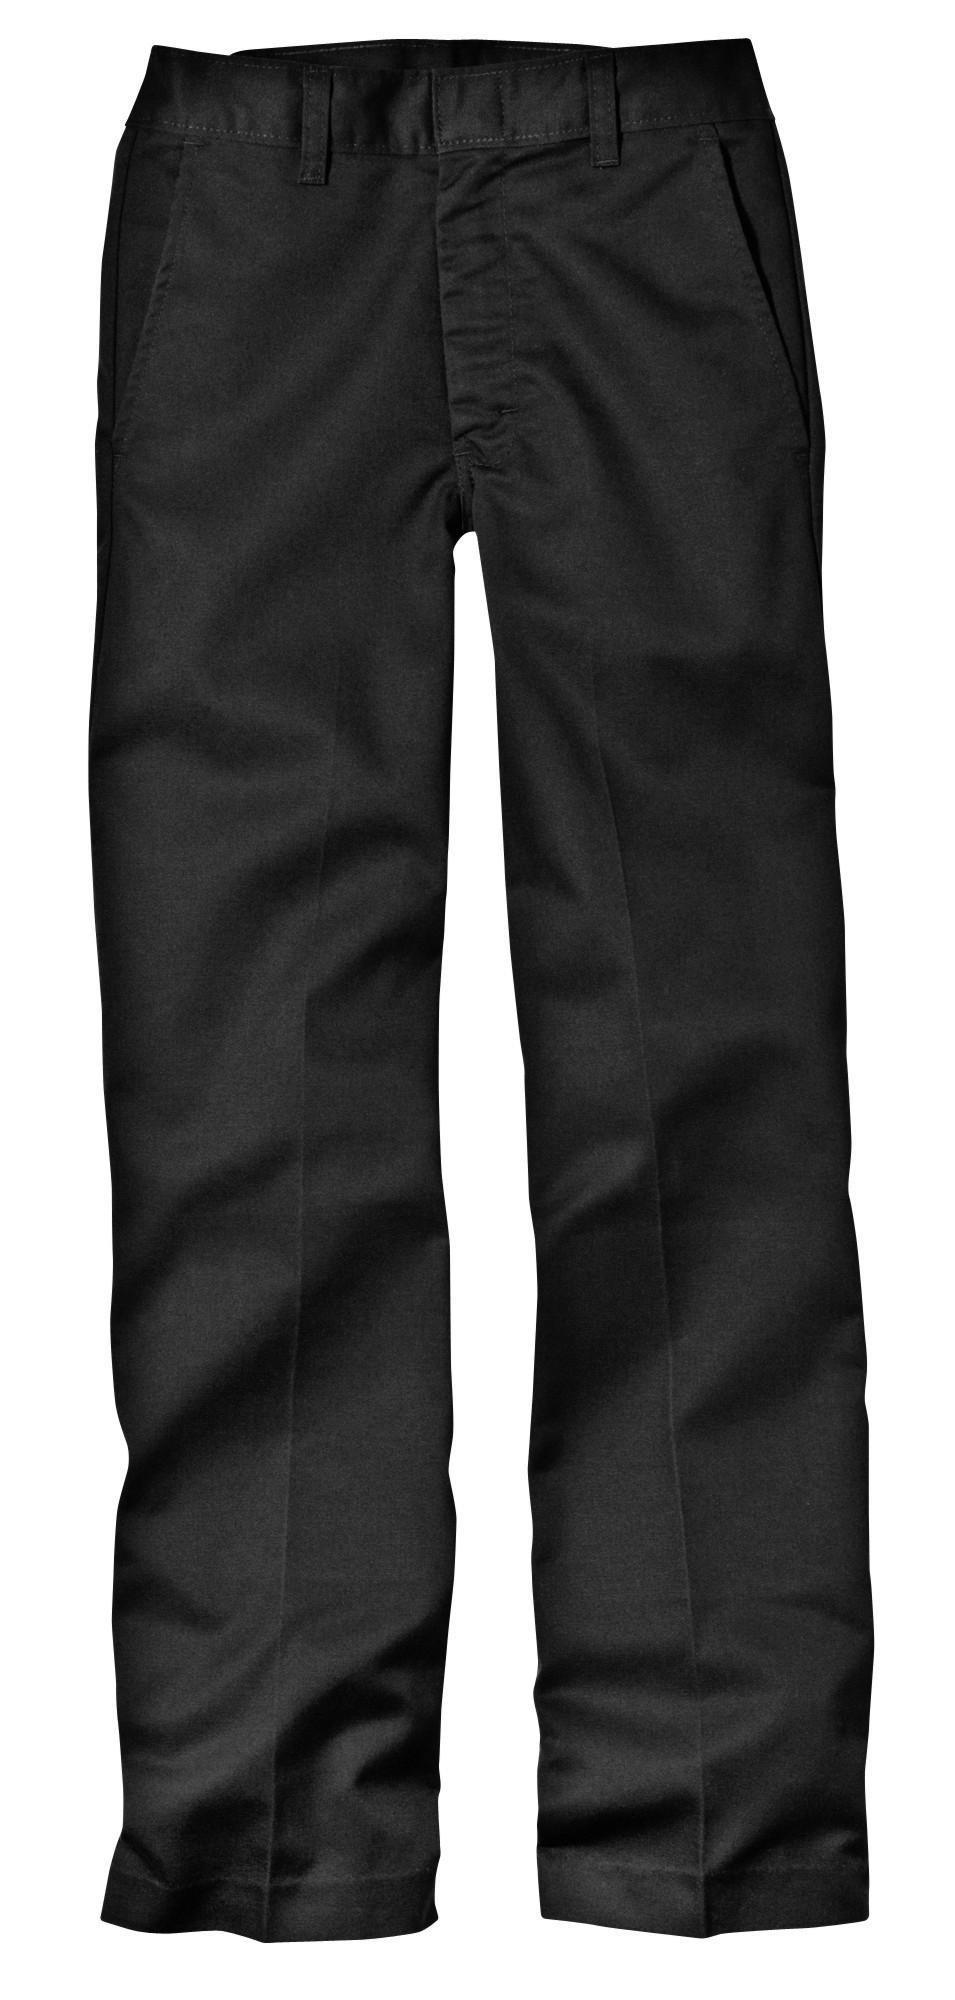 Dickies Little Boys' Classic Flat Front Pant,Black,12 Regular